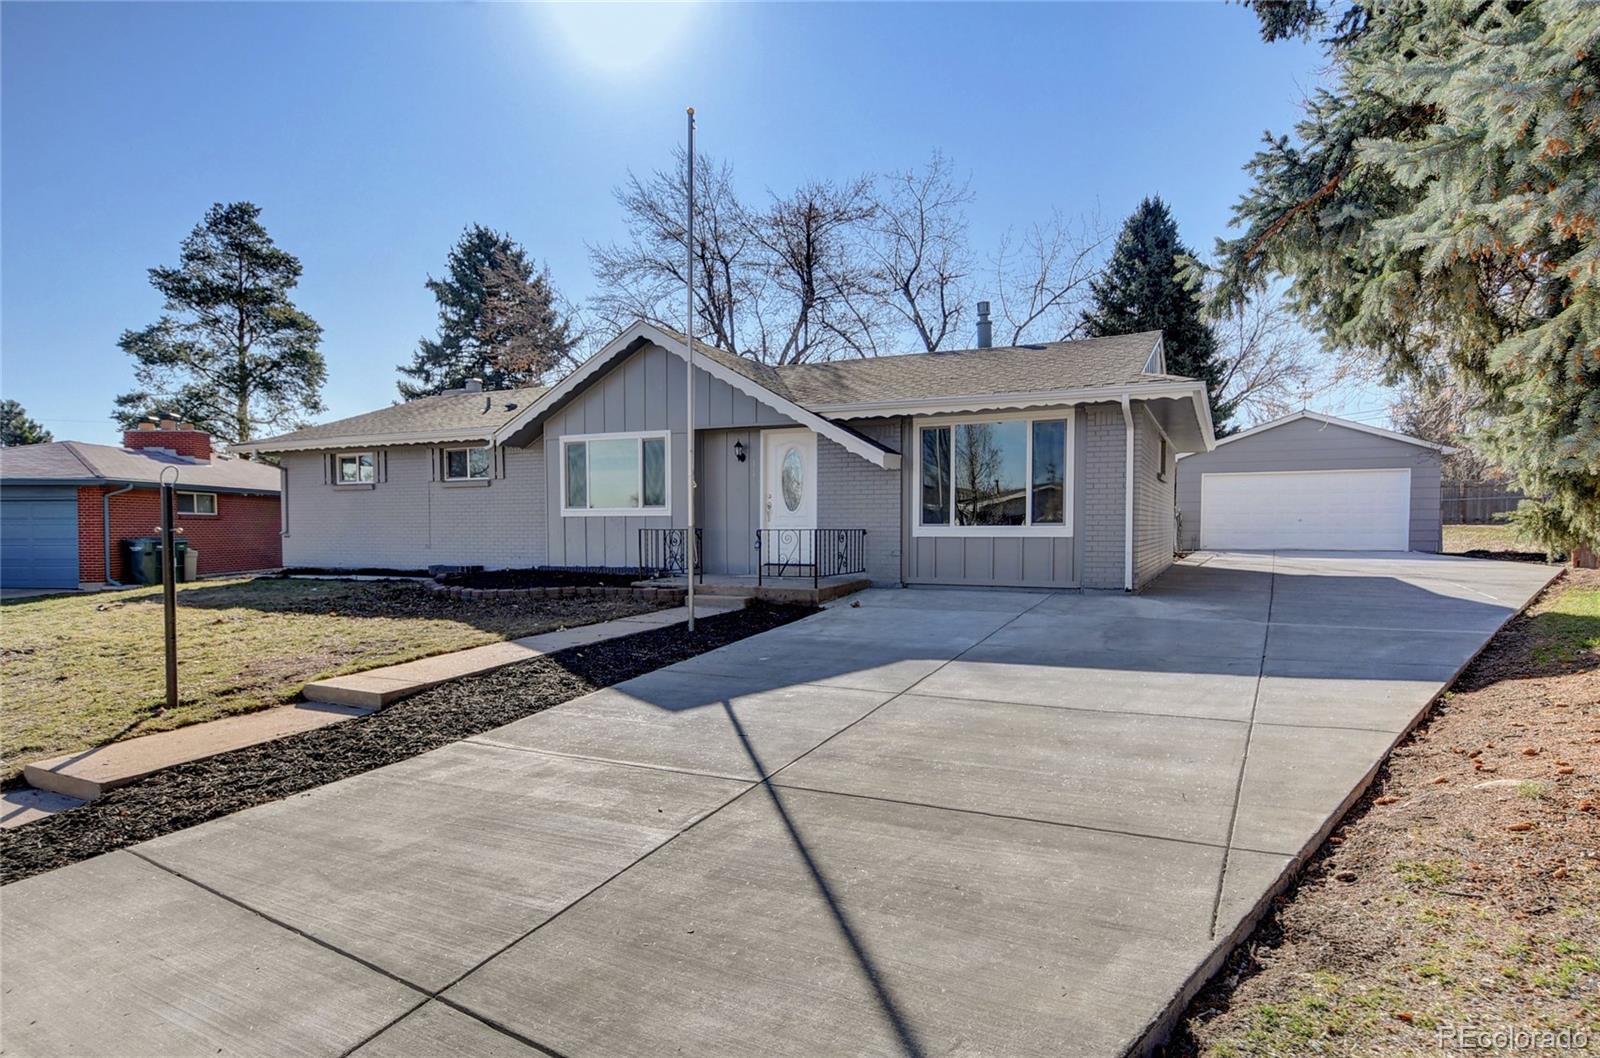 6116 S Adams Drive, Centennial, CO 80121 - Centennial, CO real estate listing